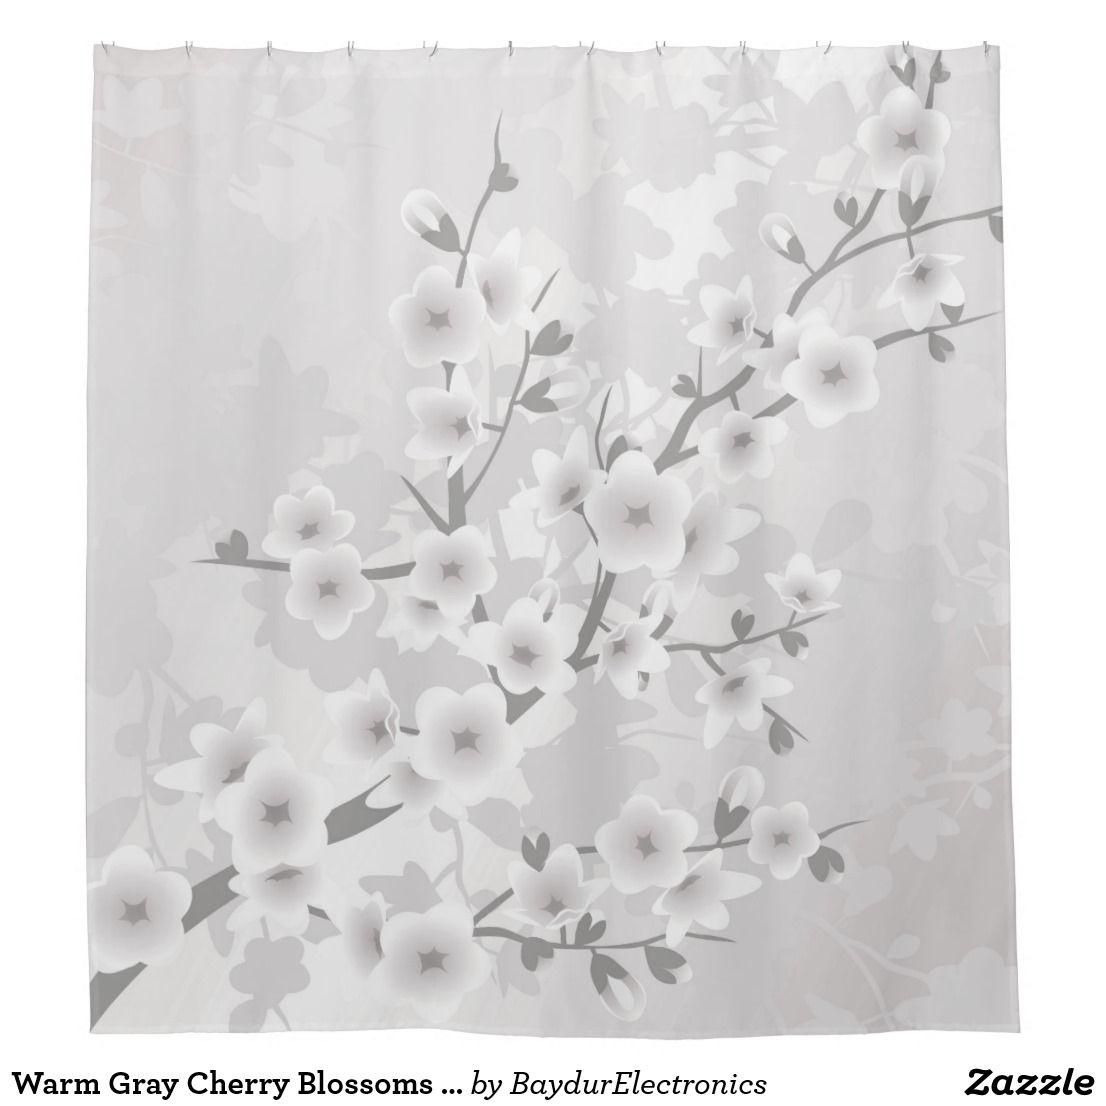 Warm Gray Cherry Blossoms Classic Shower Curtain Zazzle Com Floral Shower Curtains Flower Shower Curtain Classic Showers